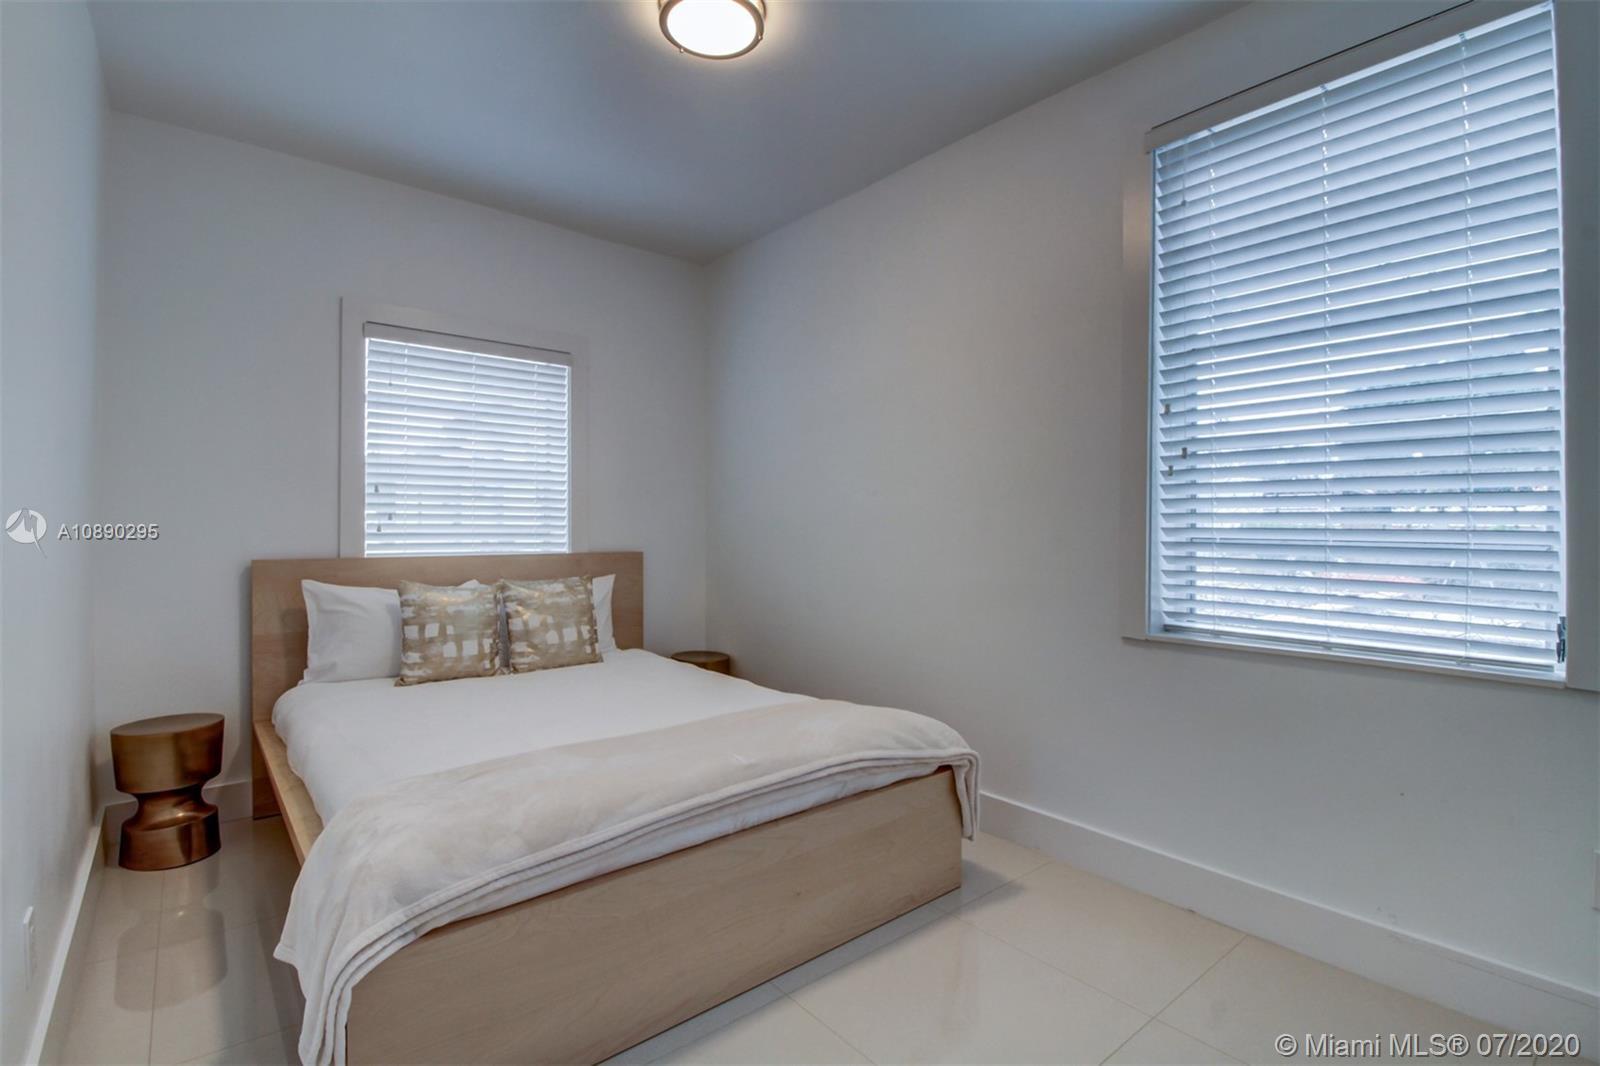 /  3416 sq. ft. $ 2020-07-09 0 Photo